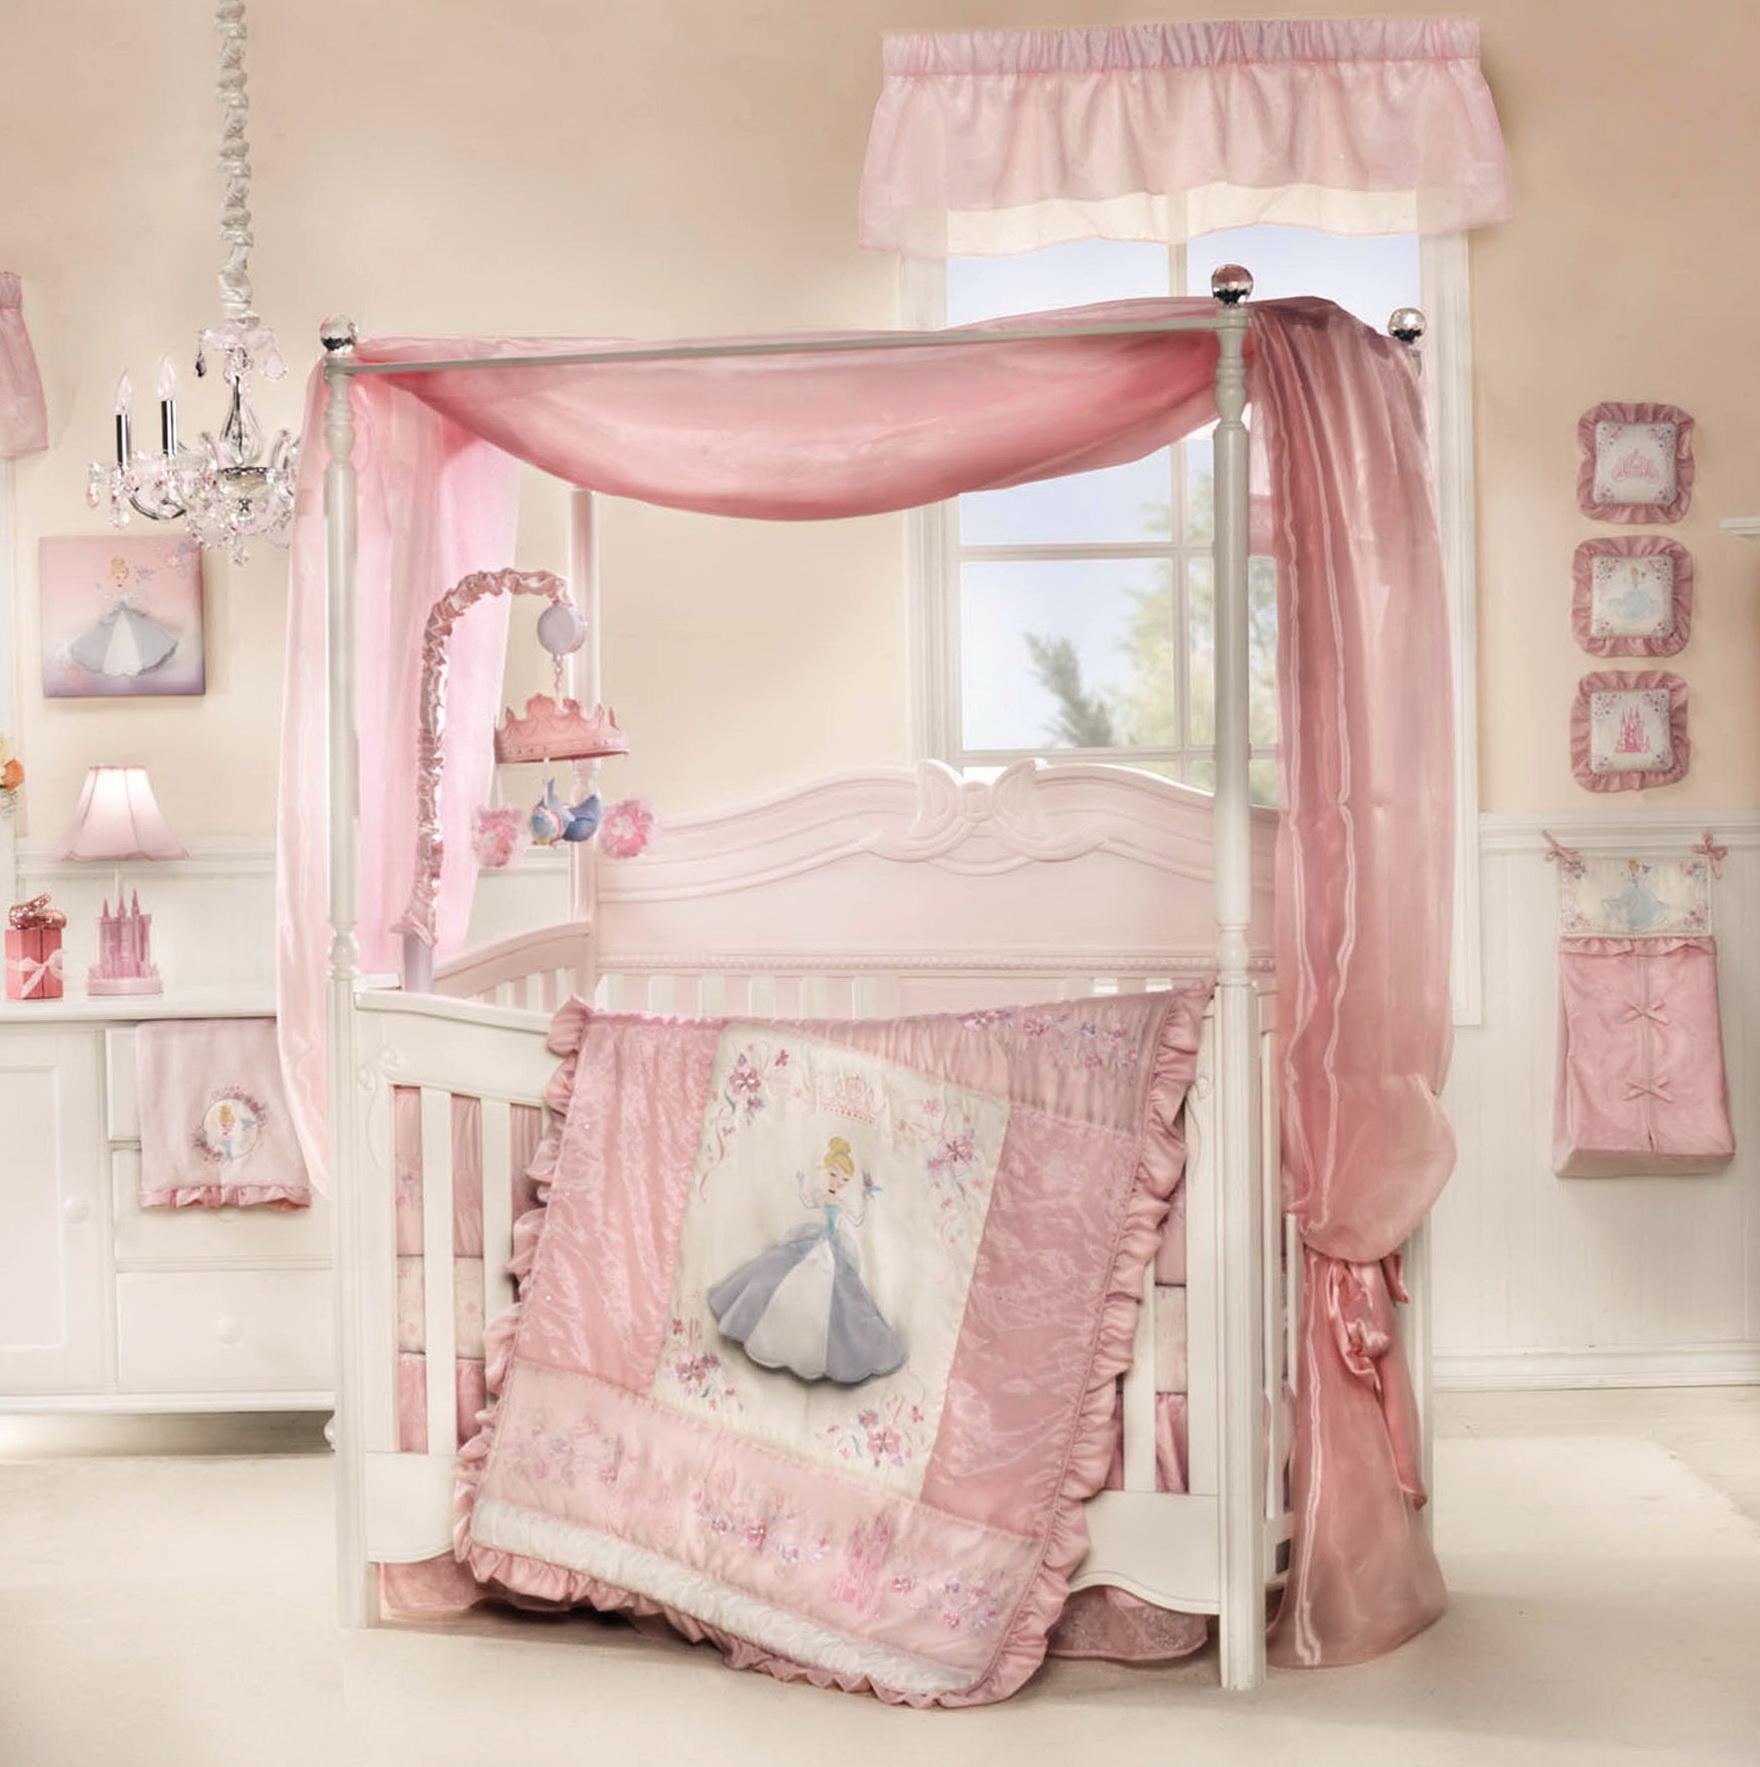 Disney Baby Nursery Bedding